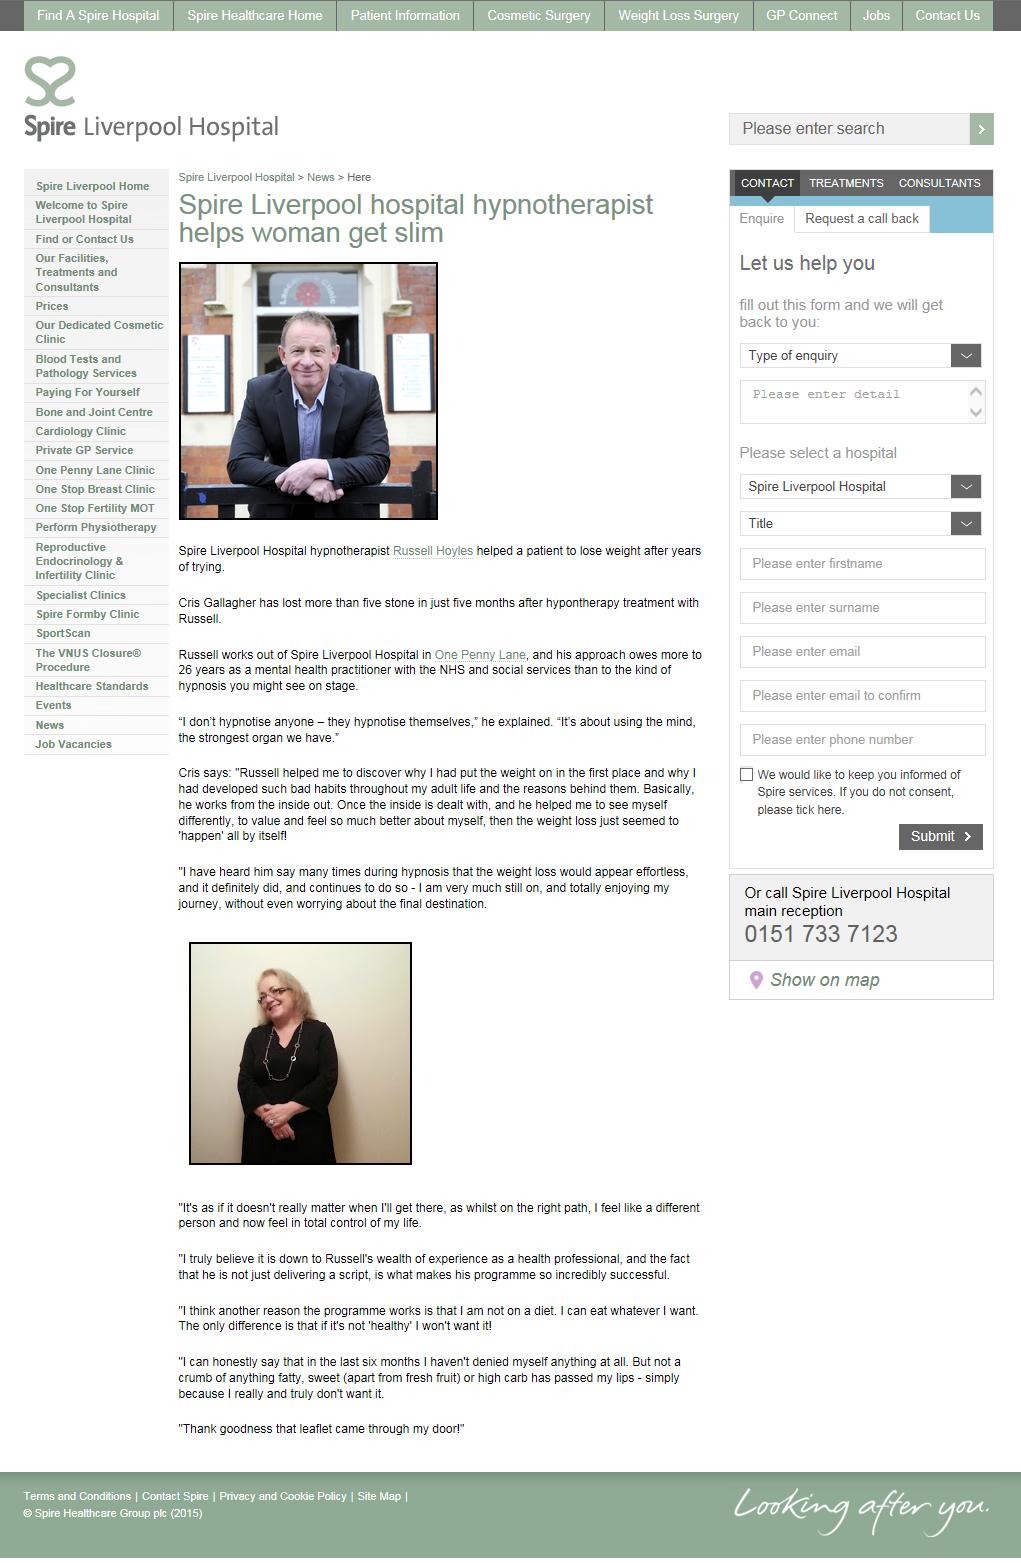 Russell Hoyles in the Media - BBC, Liverpool Echo, Radio City